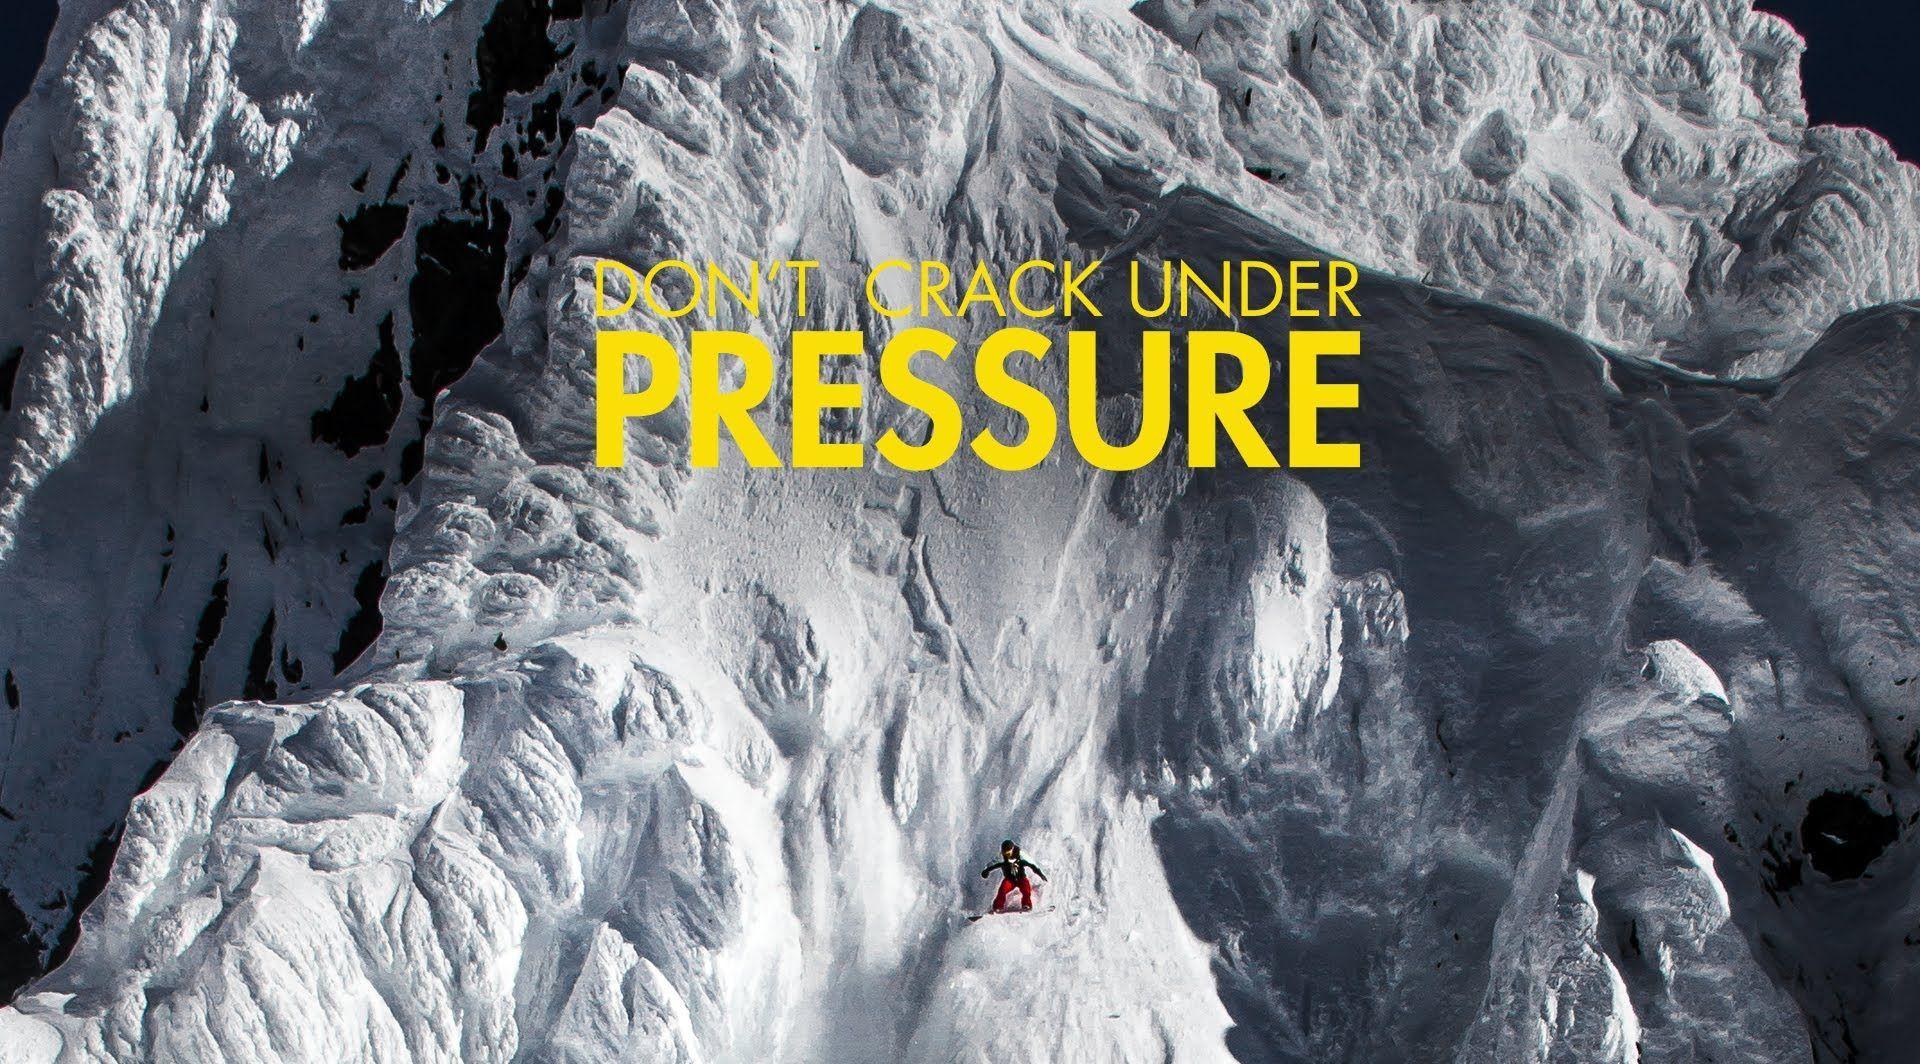 Don't Crack Under Pressure Season 2